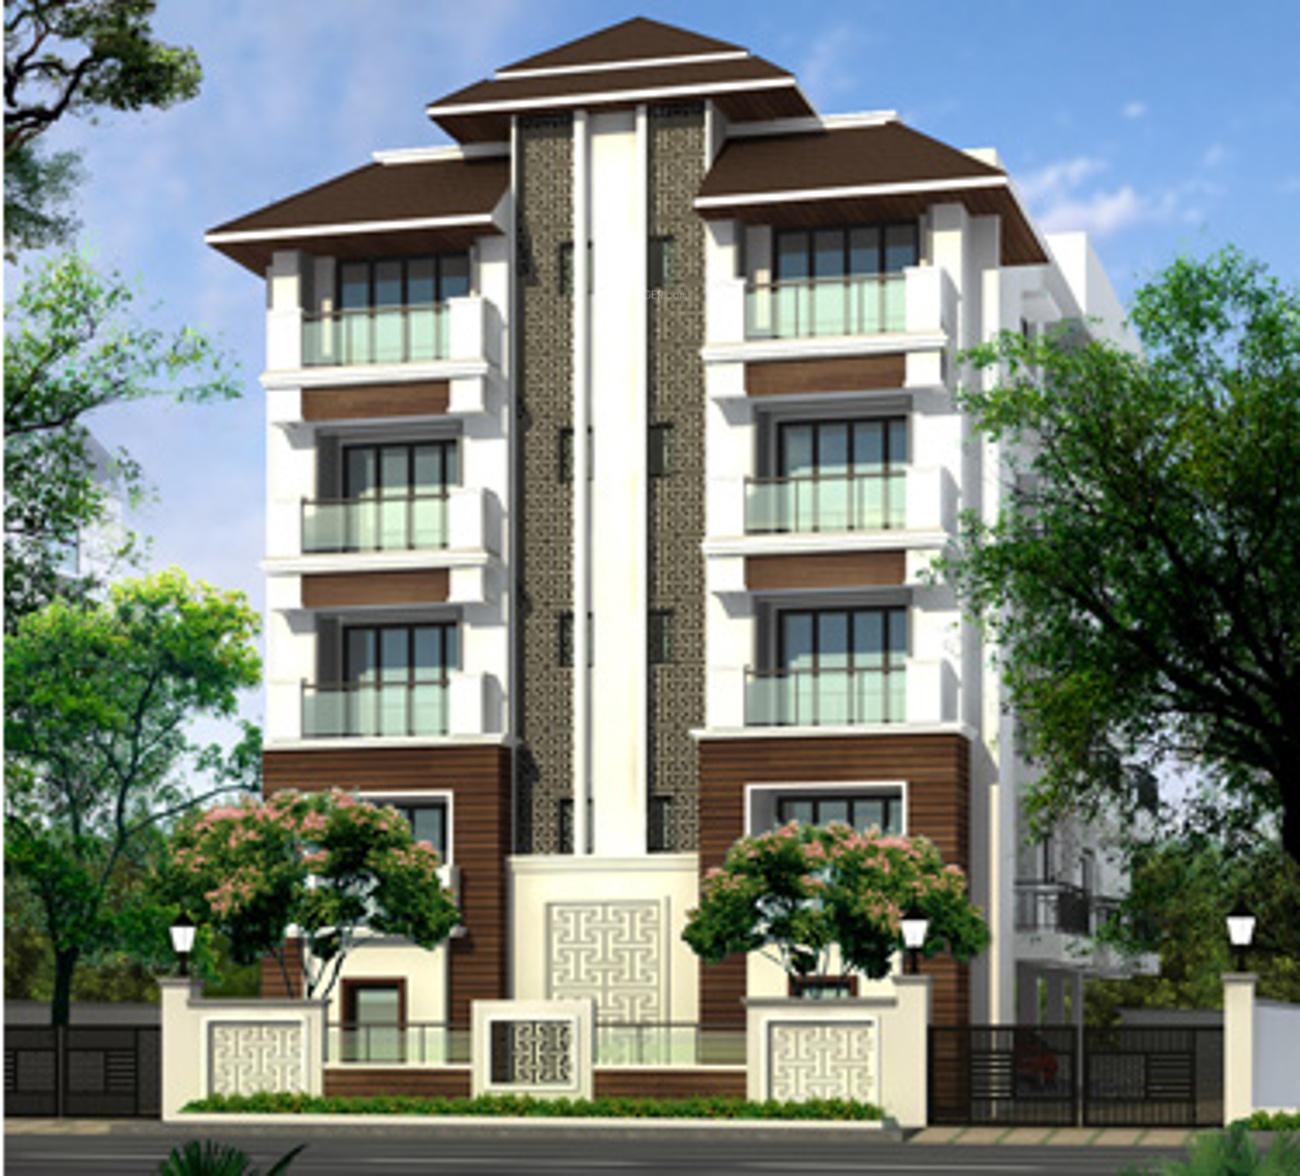 3 Floor Apartment Elevation : Sq ft bhk t apartment for sale in sumanth sreshta